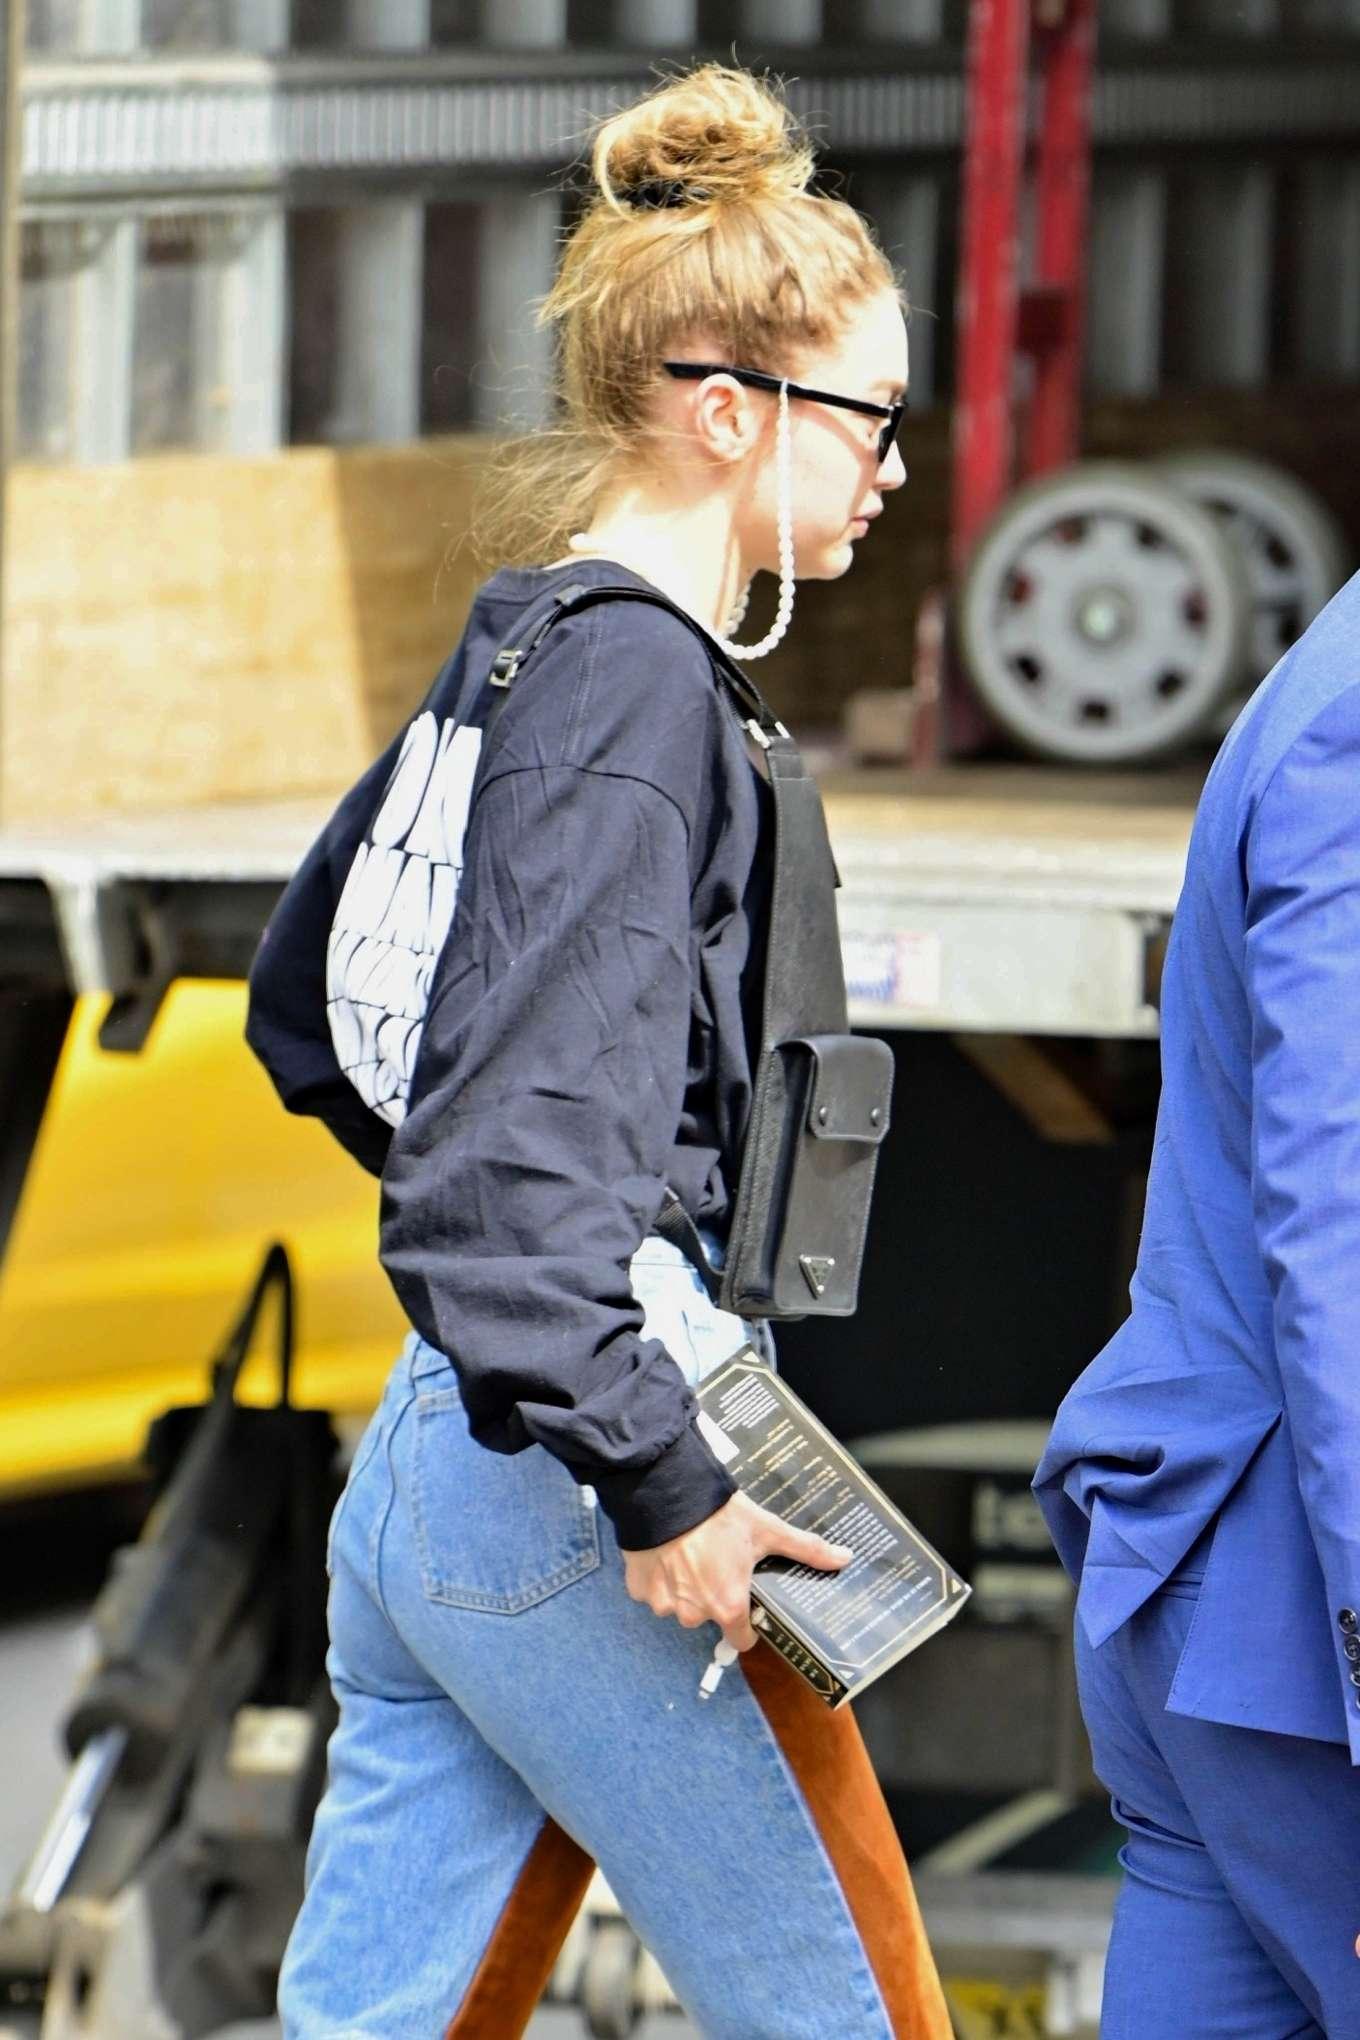 Gigi Hadid - Heading to a photoshoot in NYC